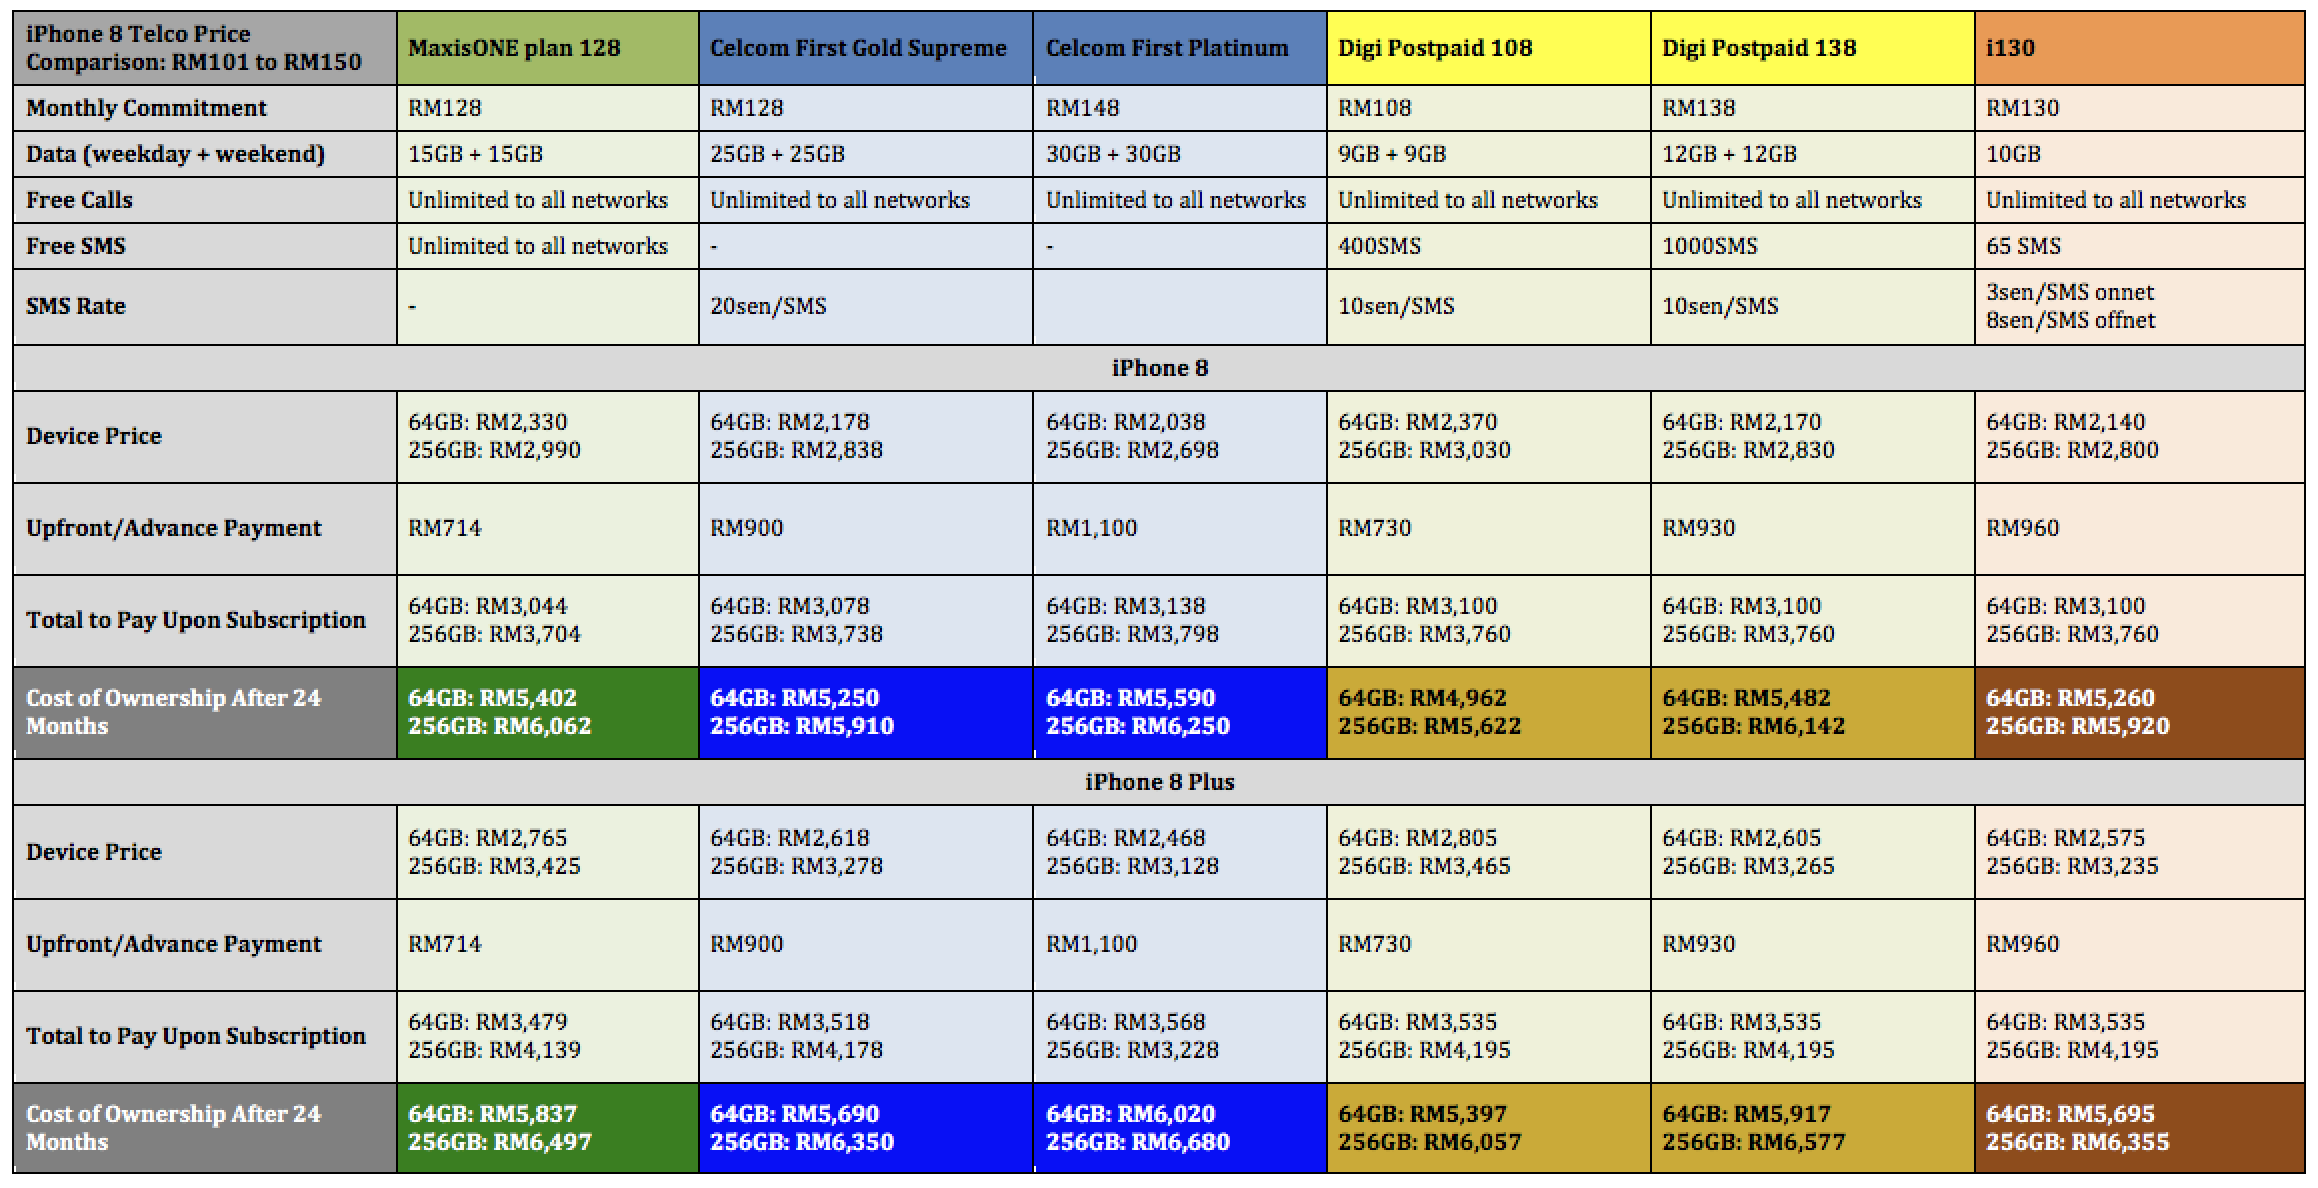 iPhone 8 Telco Price Comparison